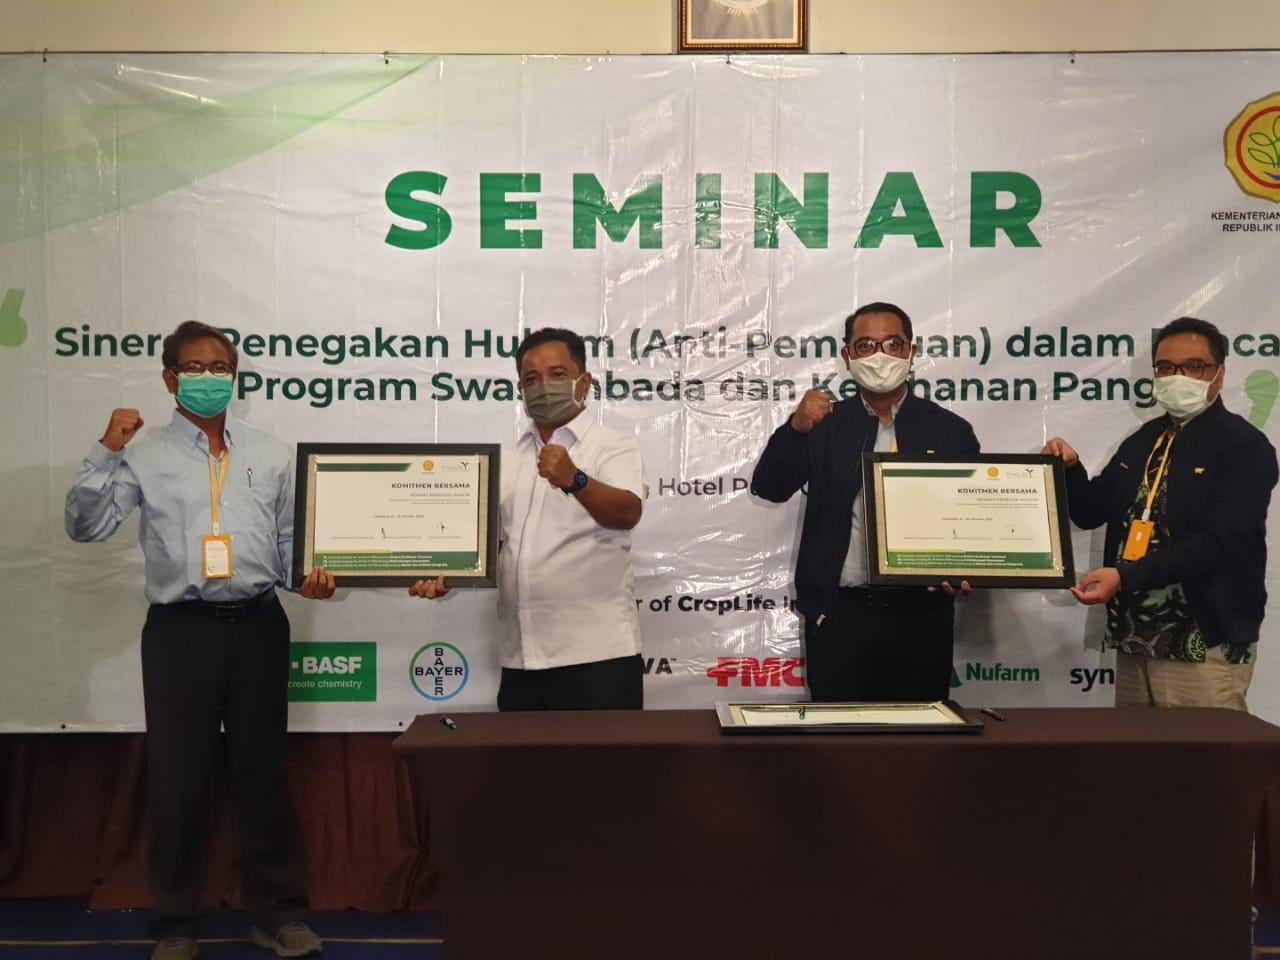 CropLife Indonesia Ajak Para Stakeholder Bersinergi Ungkap Jaringan Pemalsu Pestisida - JPNN.com